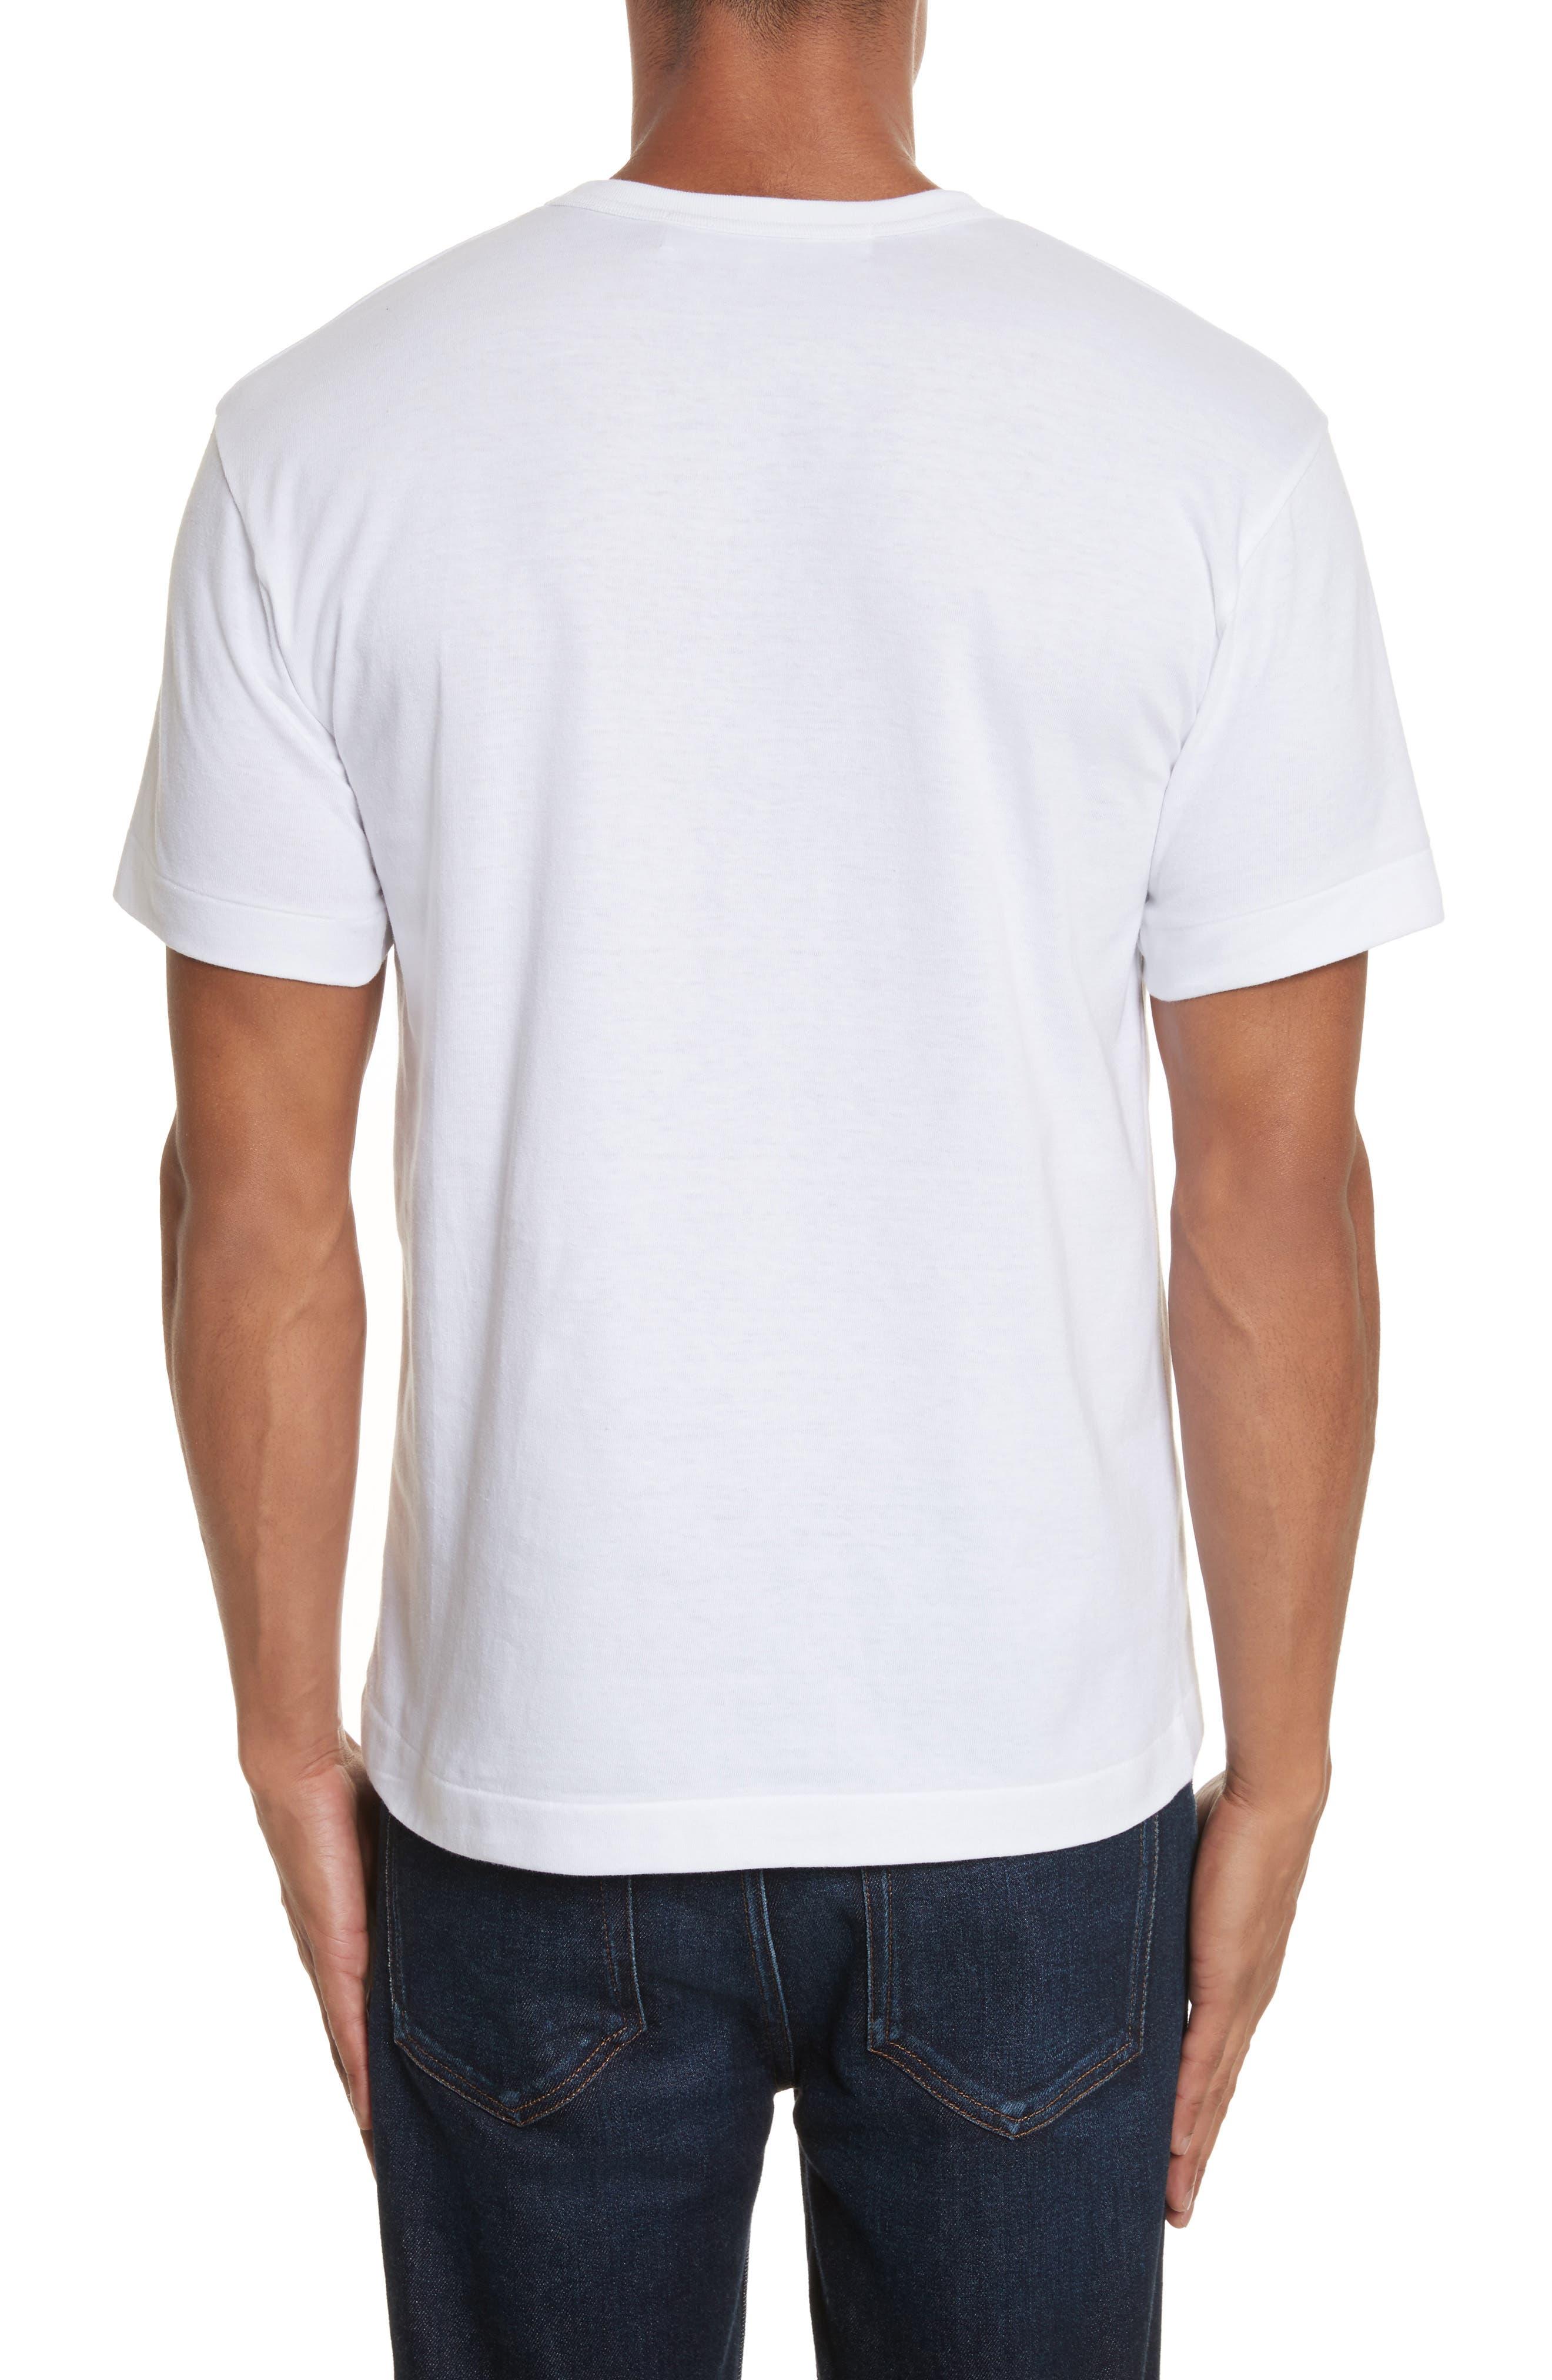 T shirt plain white front and back - T Shirt Plain White Front And Back 38